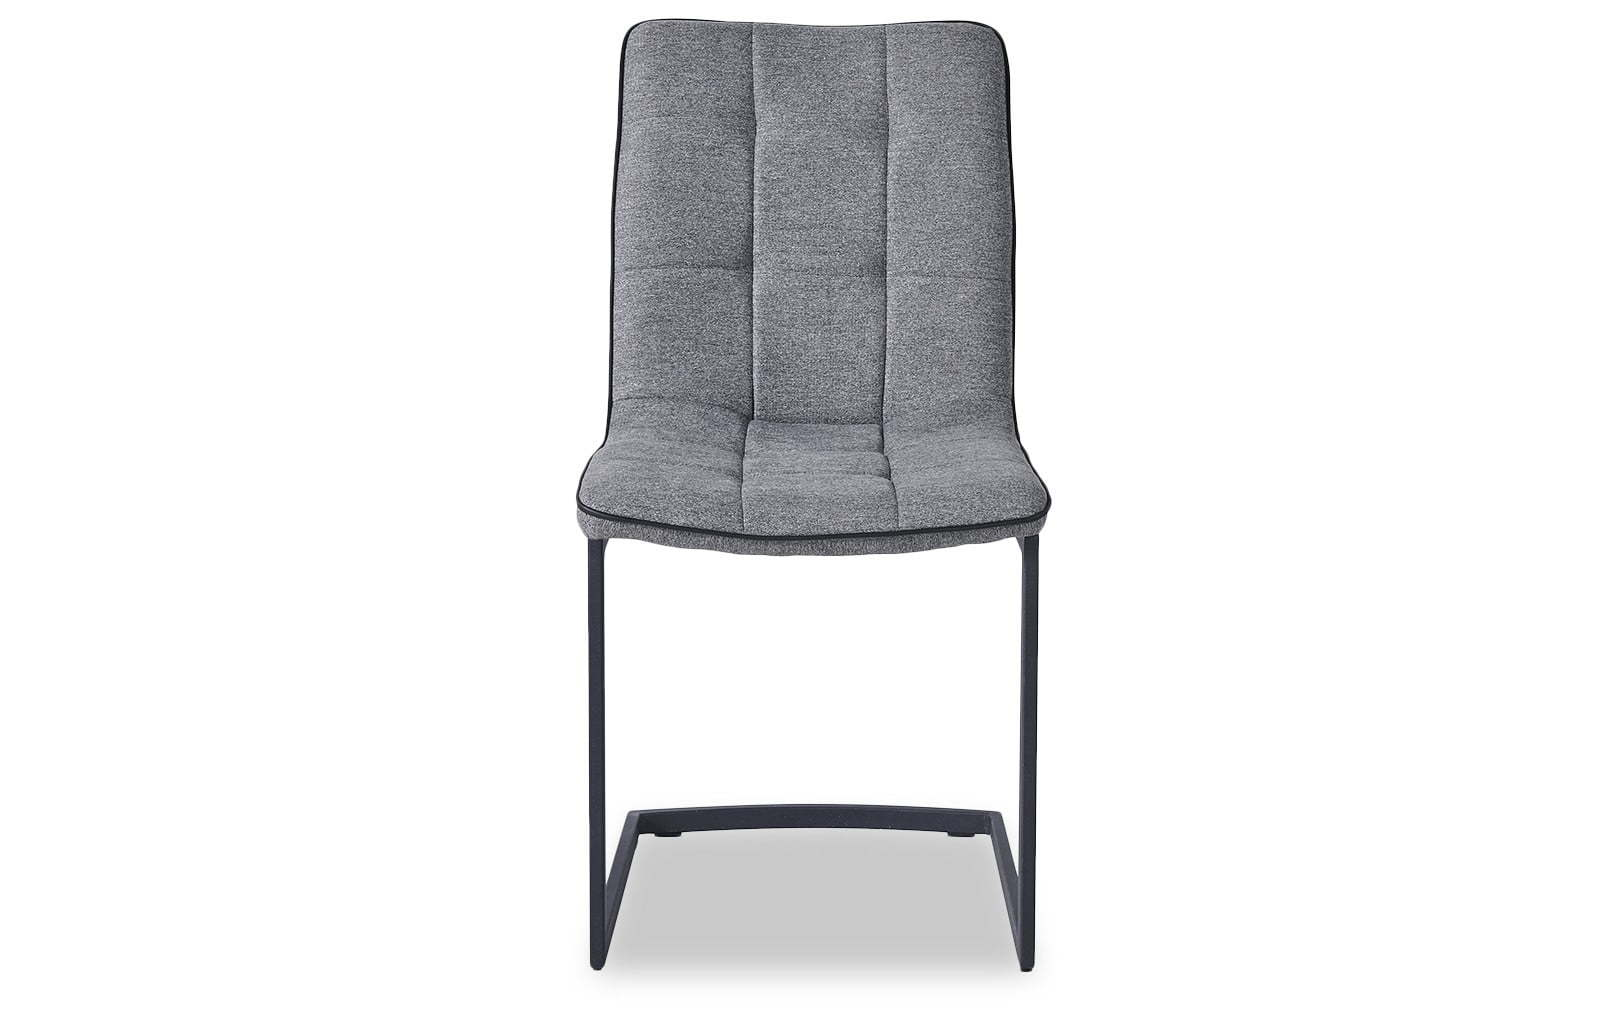 Стул SKY6800 серый